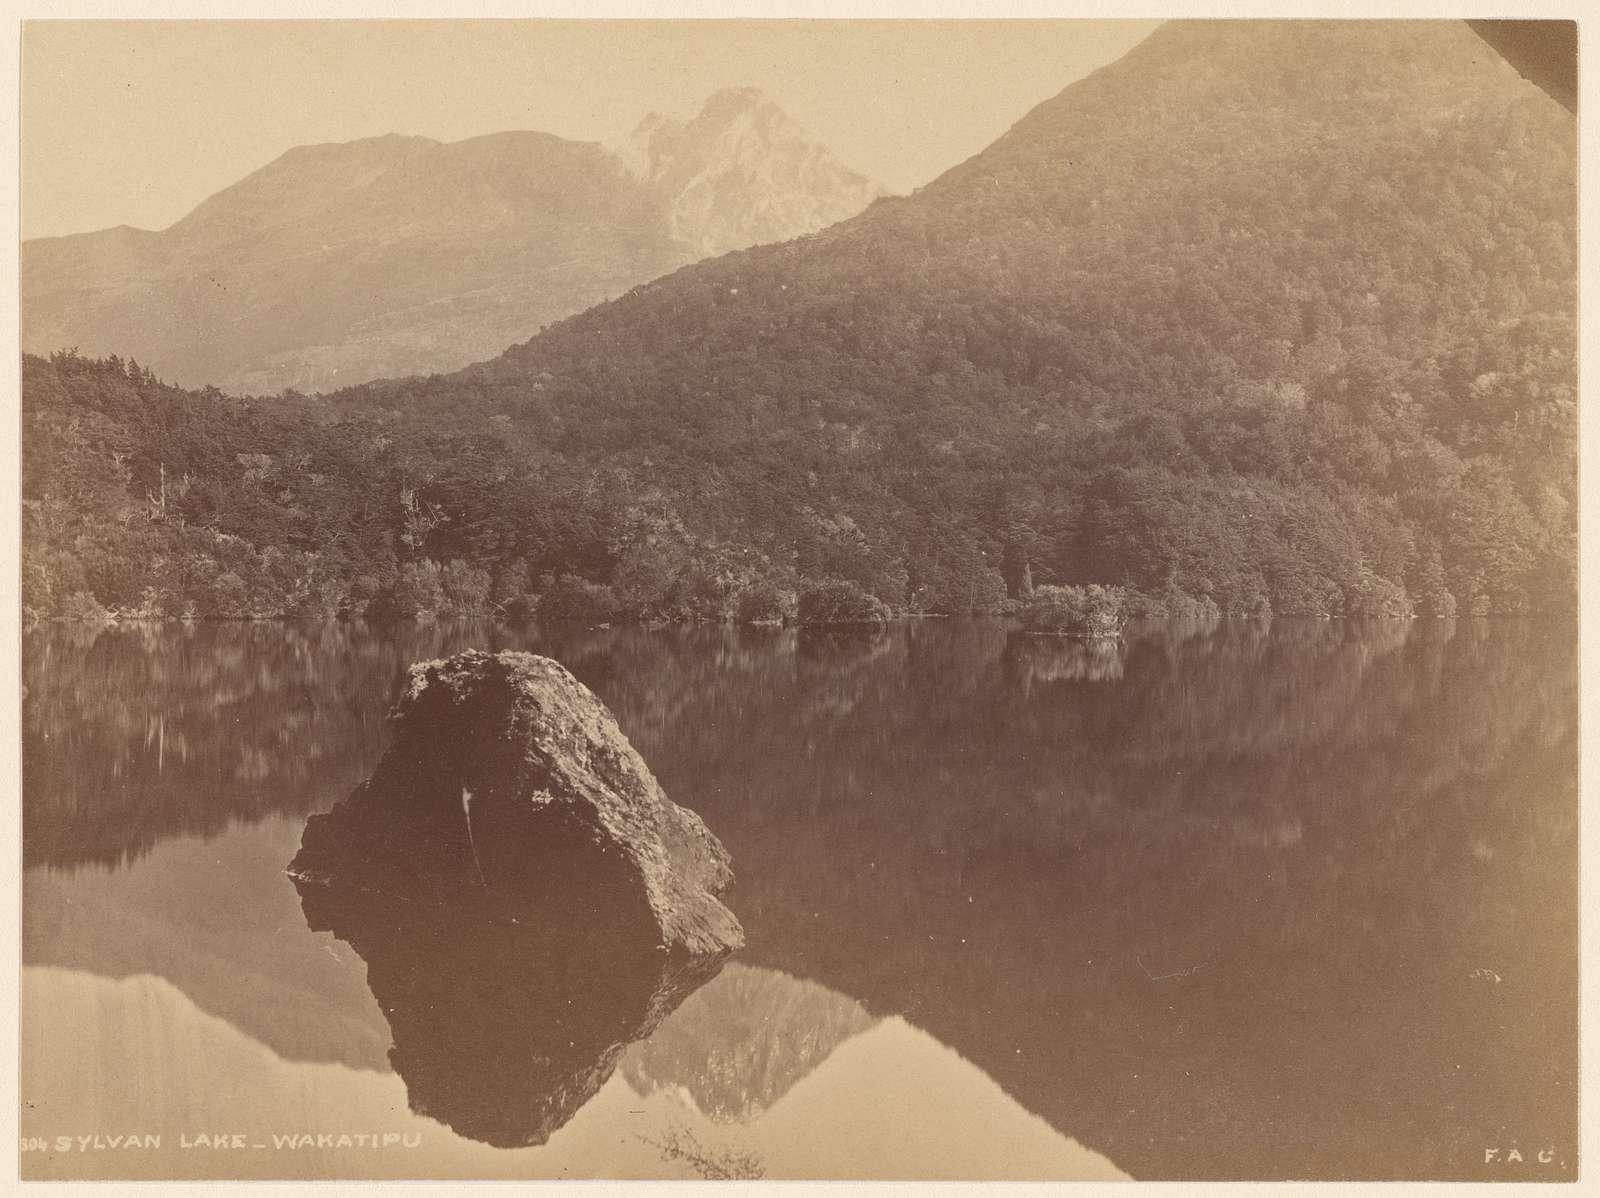 Sylvan Lake, Wakatipu